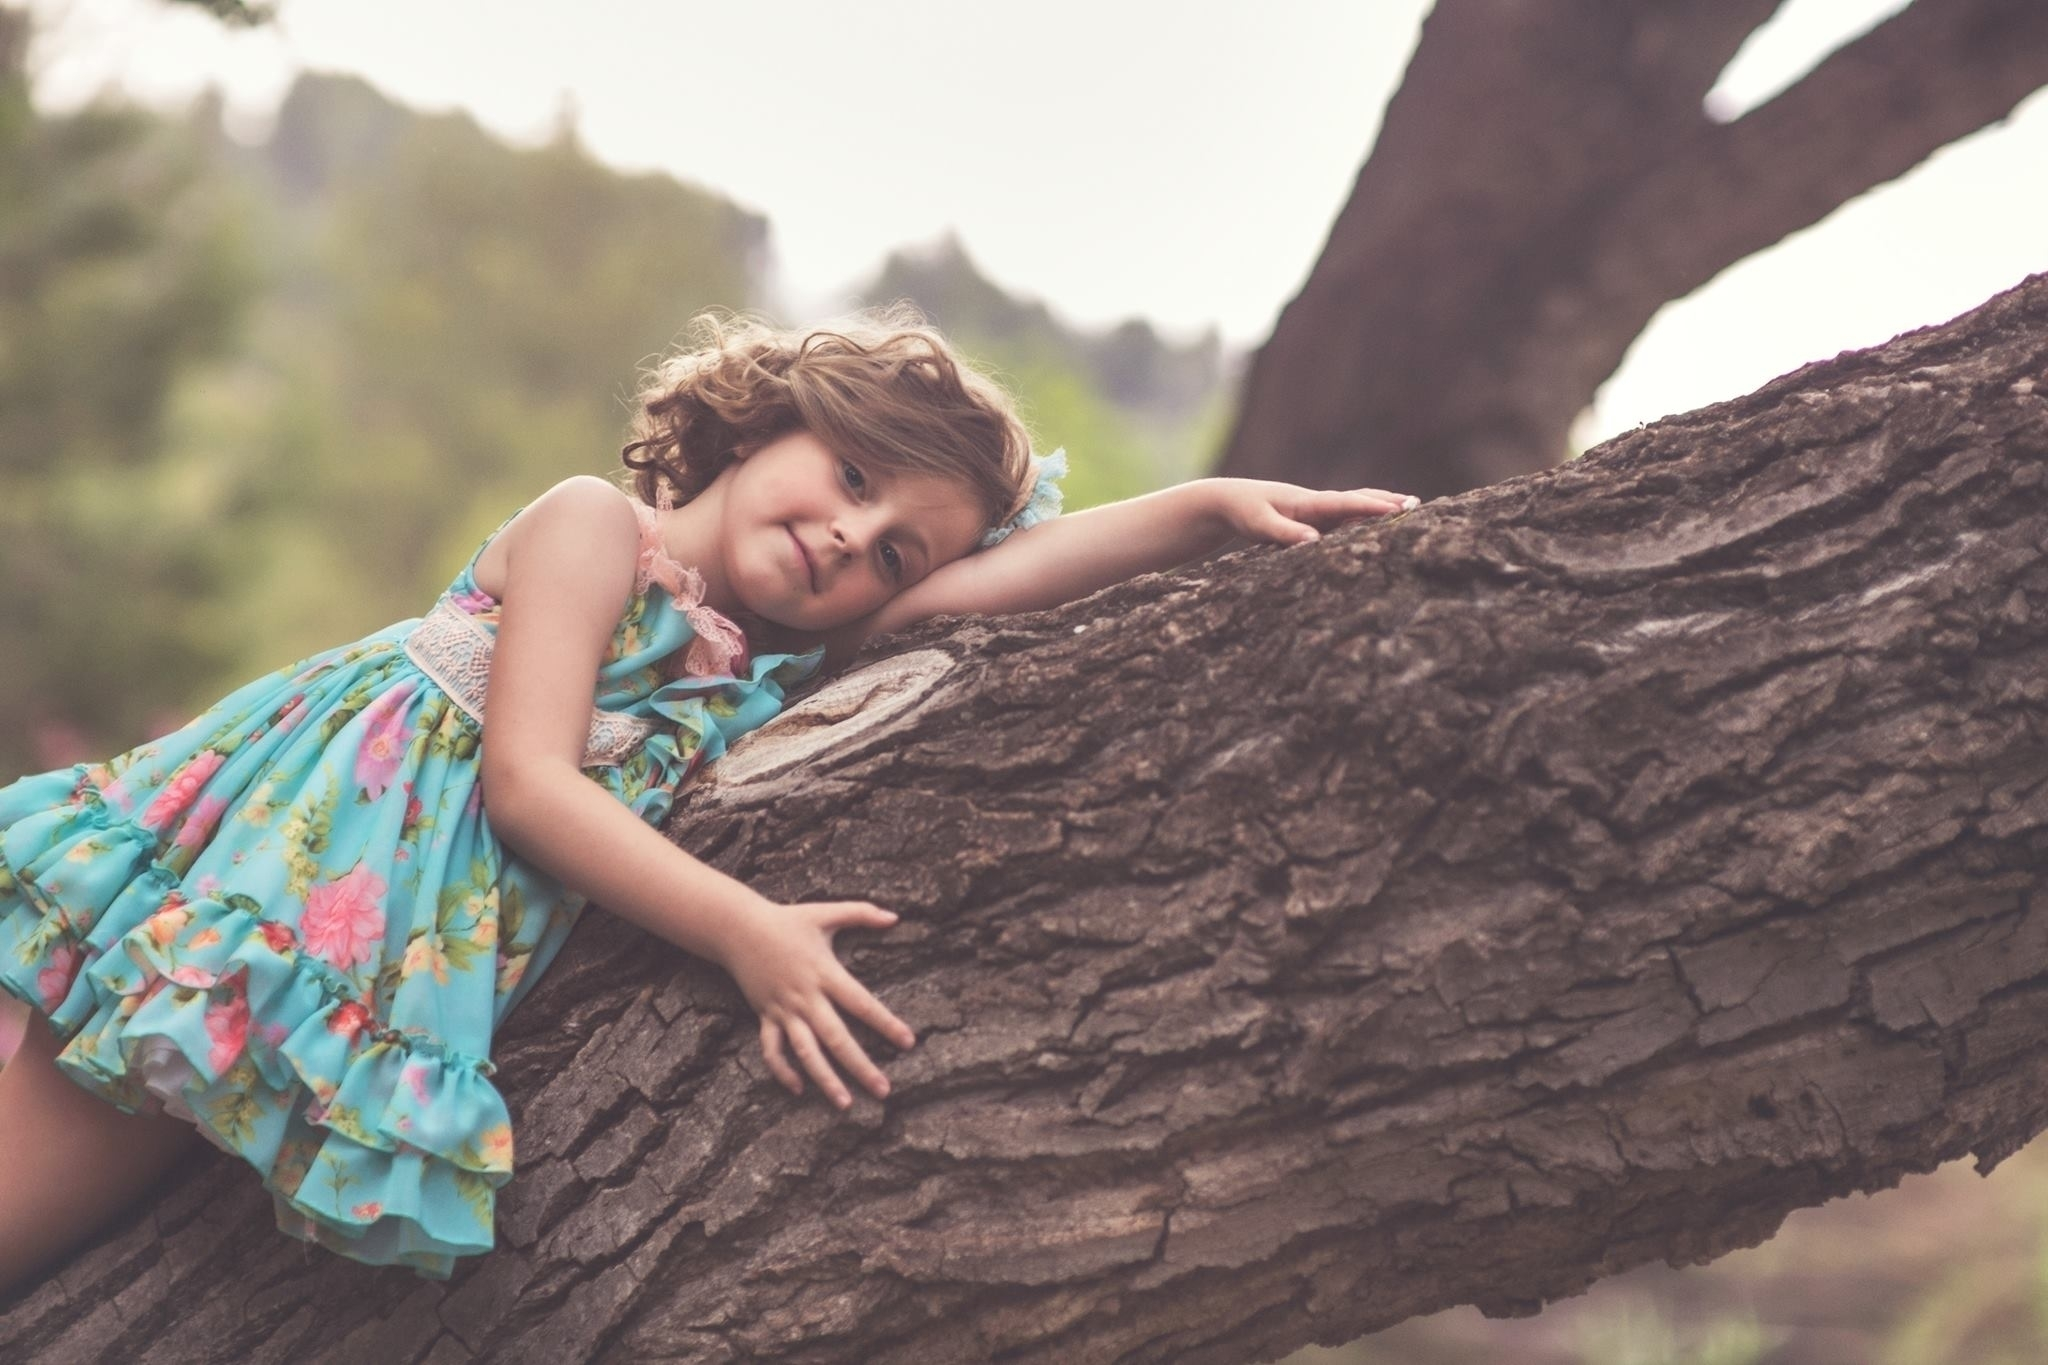 Ninos Moda Infantil (@ninosmodainfantil) Cover Image